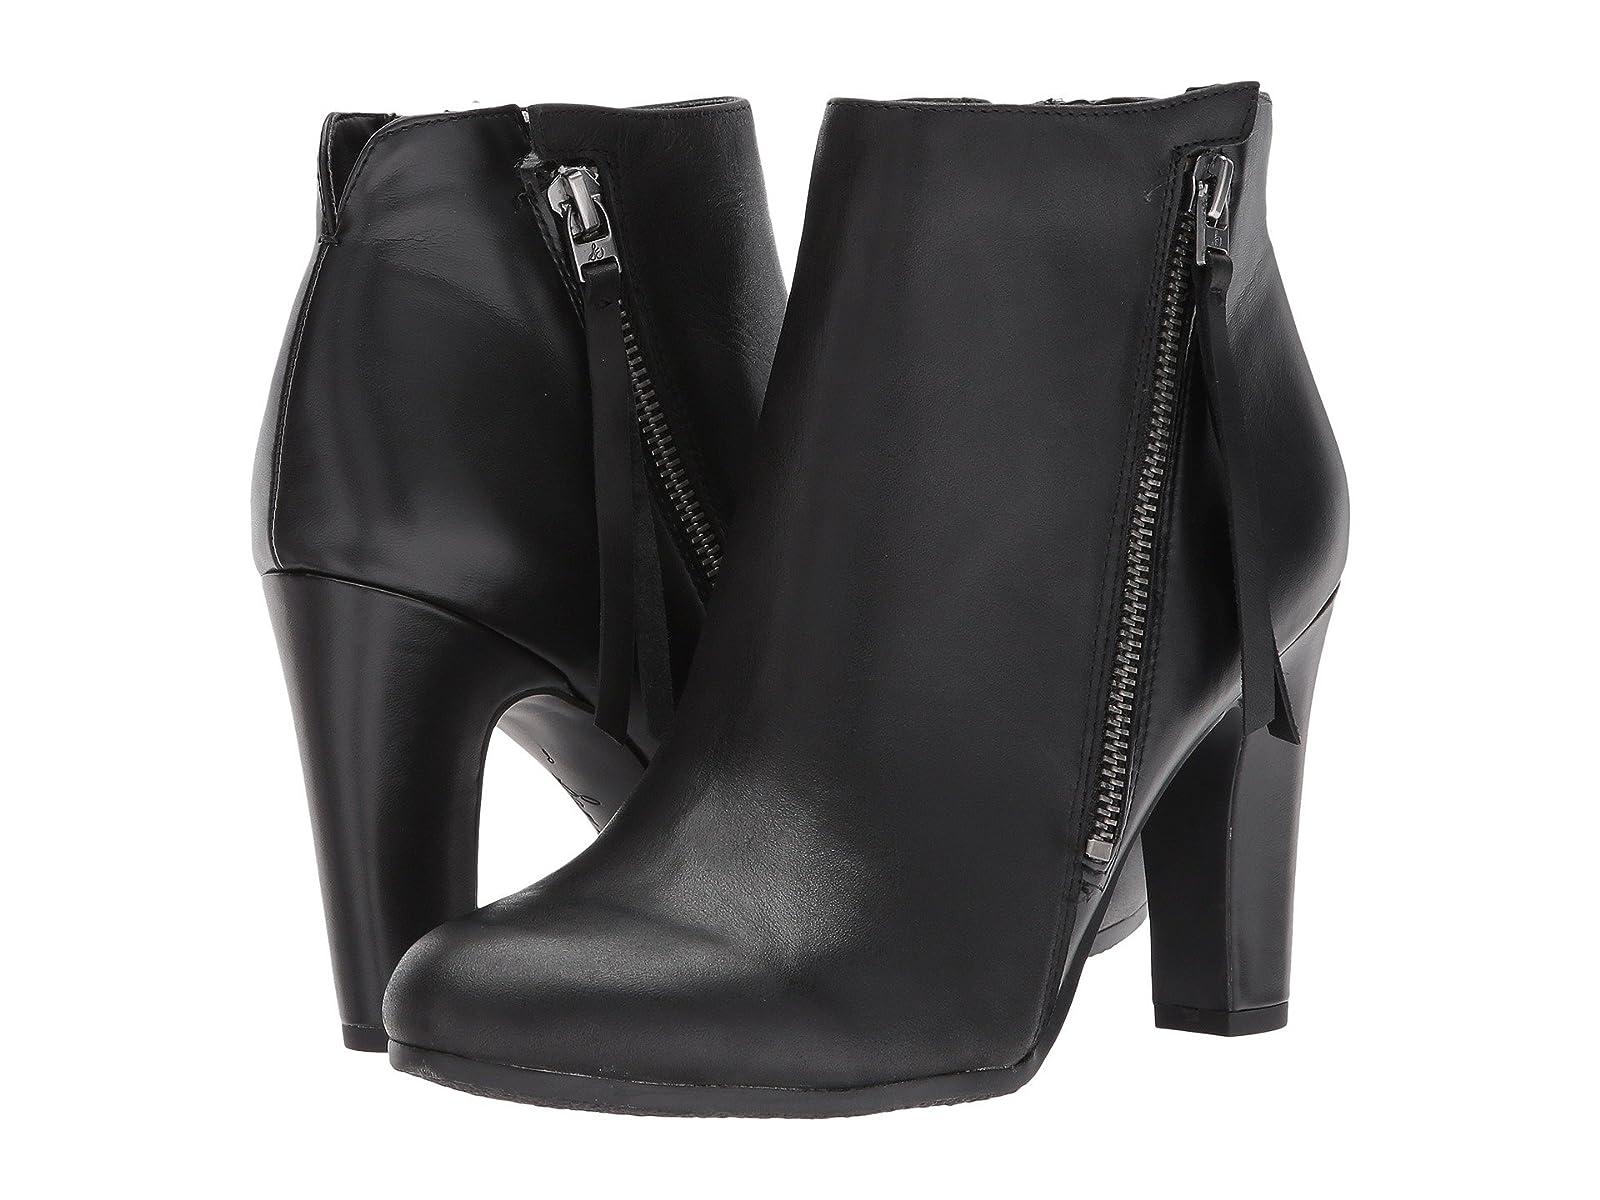 Sam Edelman SadeeEconomical and quality shoes